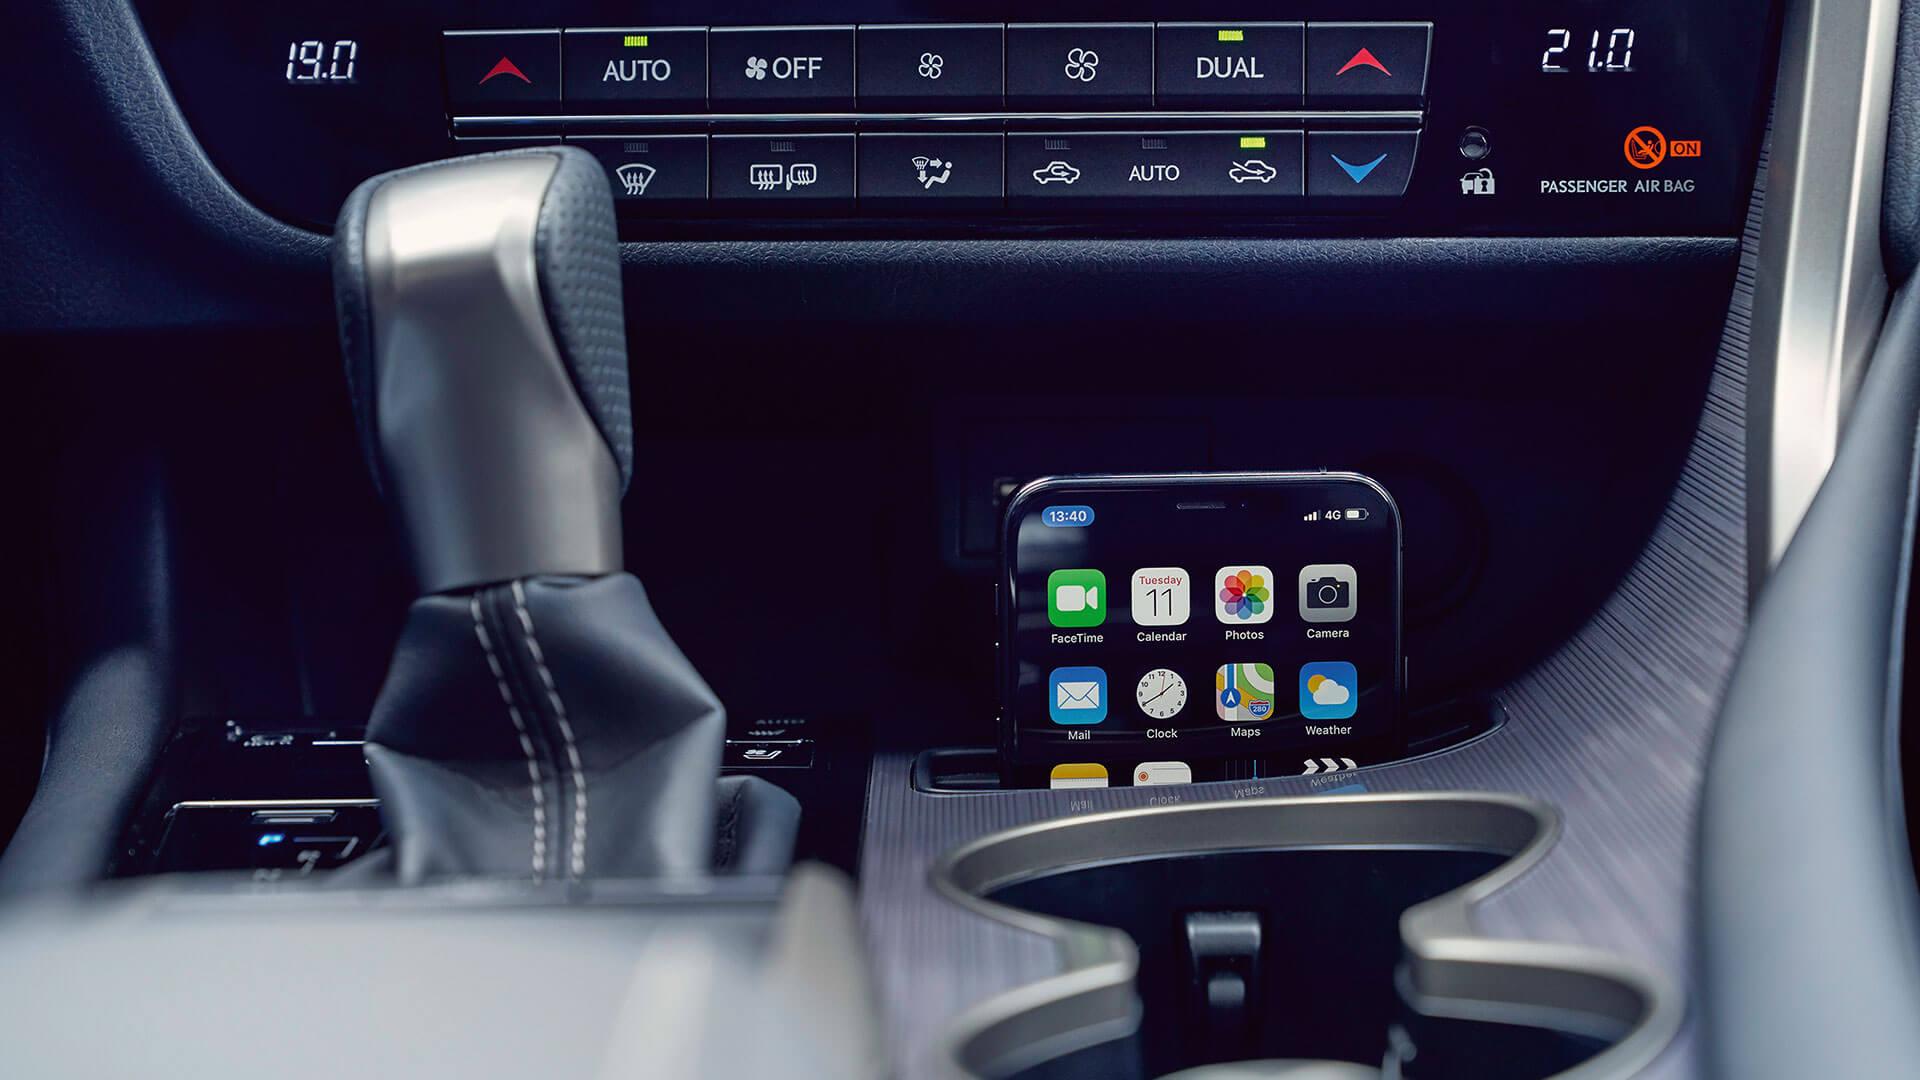 2019 lexus rx hotspot smartphone integration